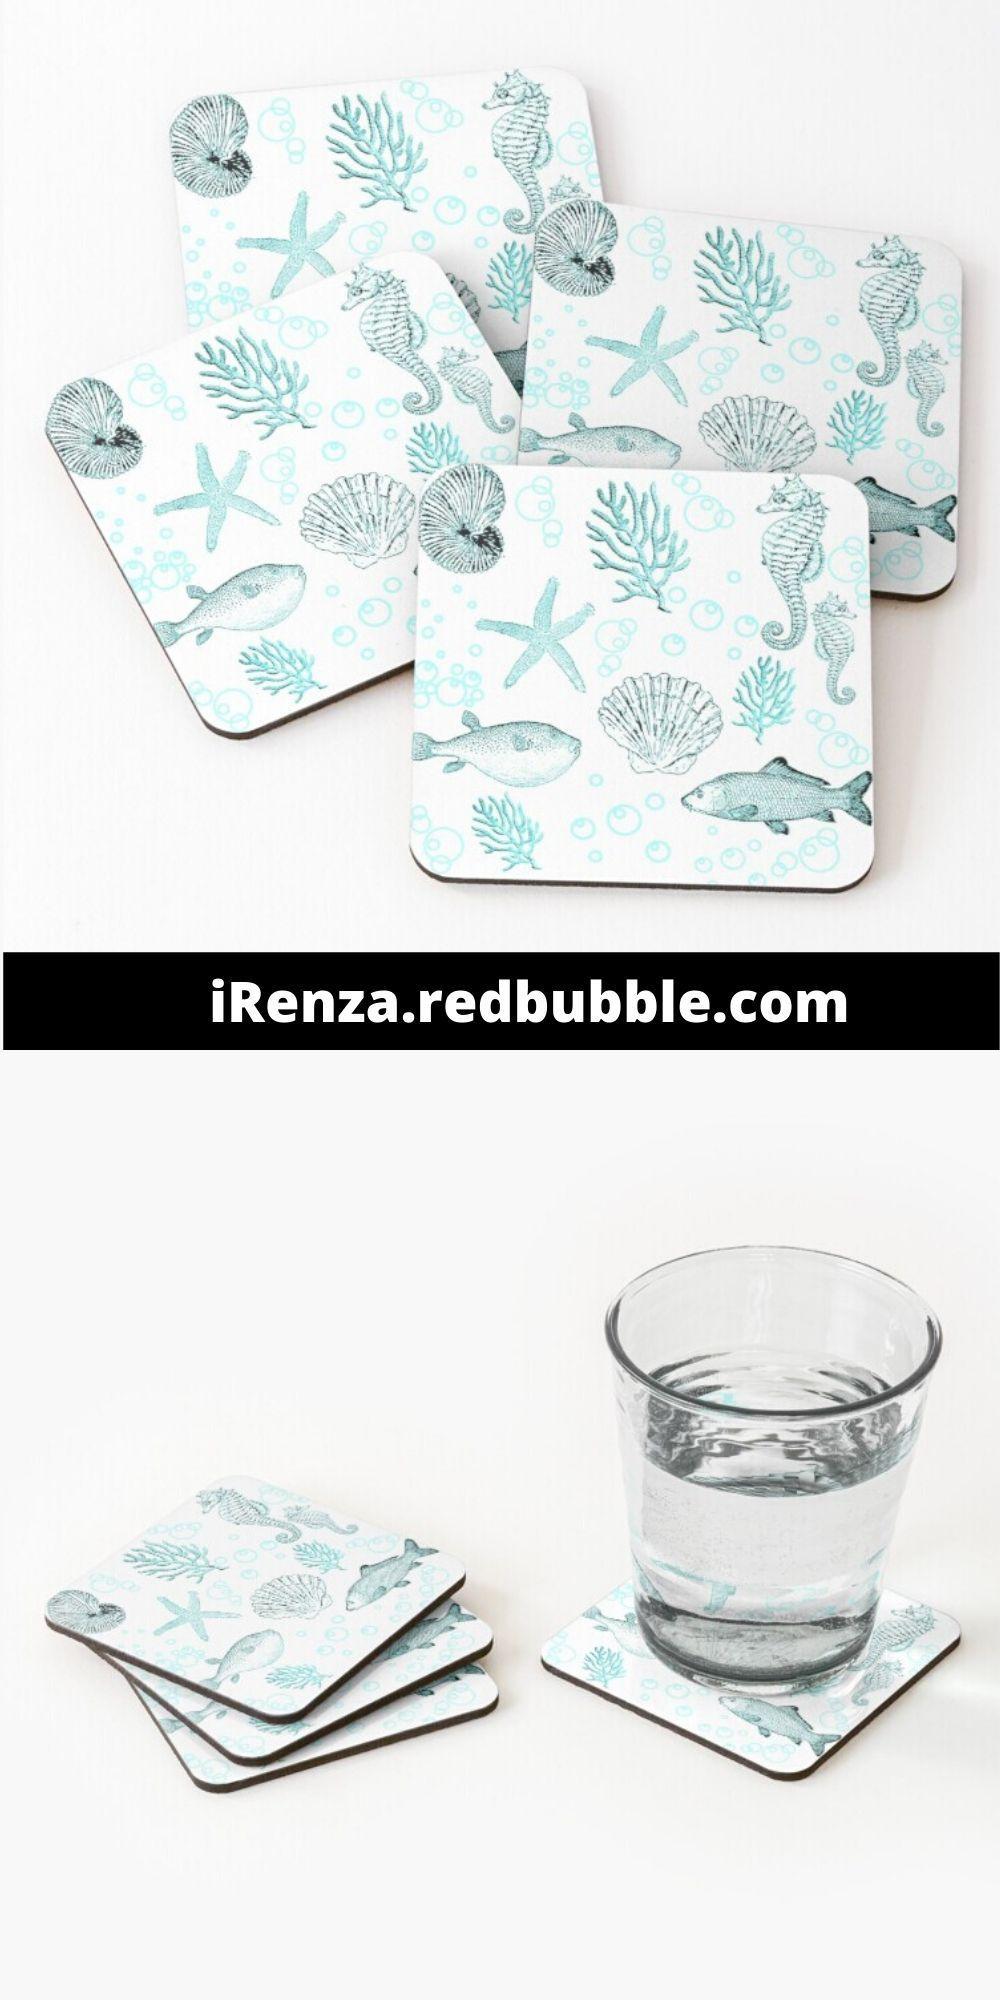 'Sea life' Coasters by iRenza. #coasters #homeaccessories #coastaldecor #homedecoraccesssories